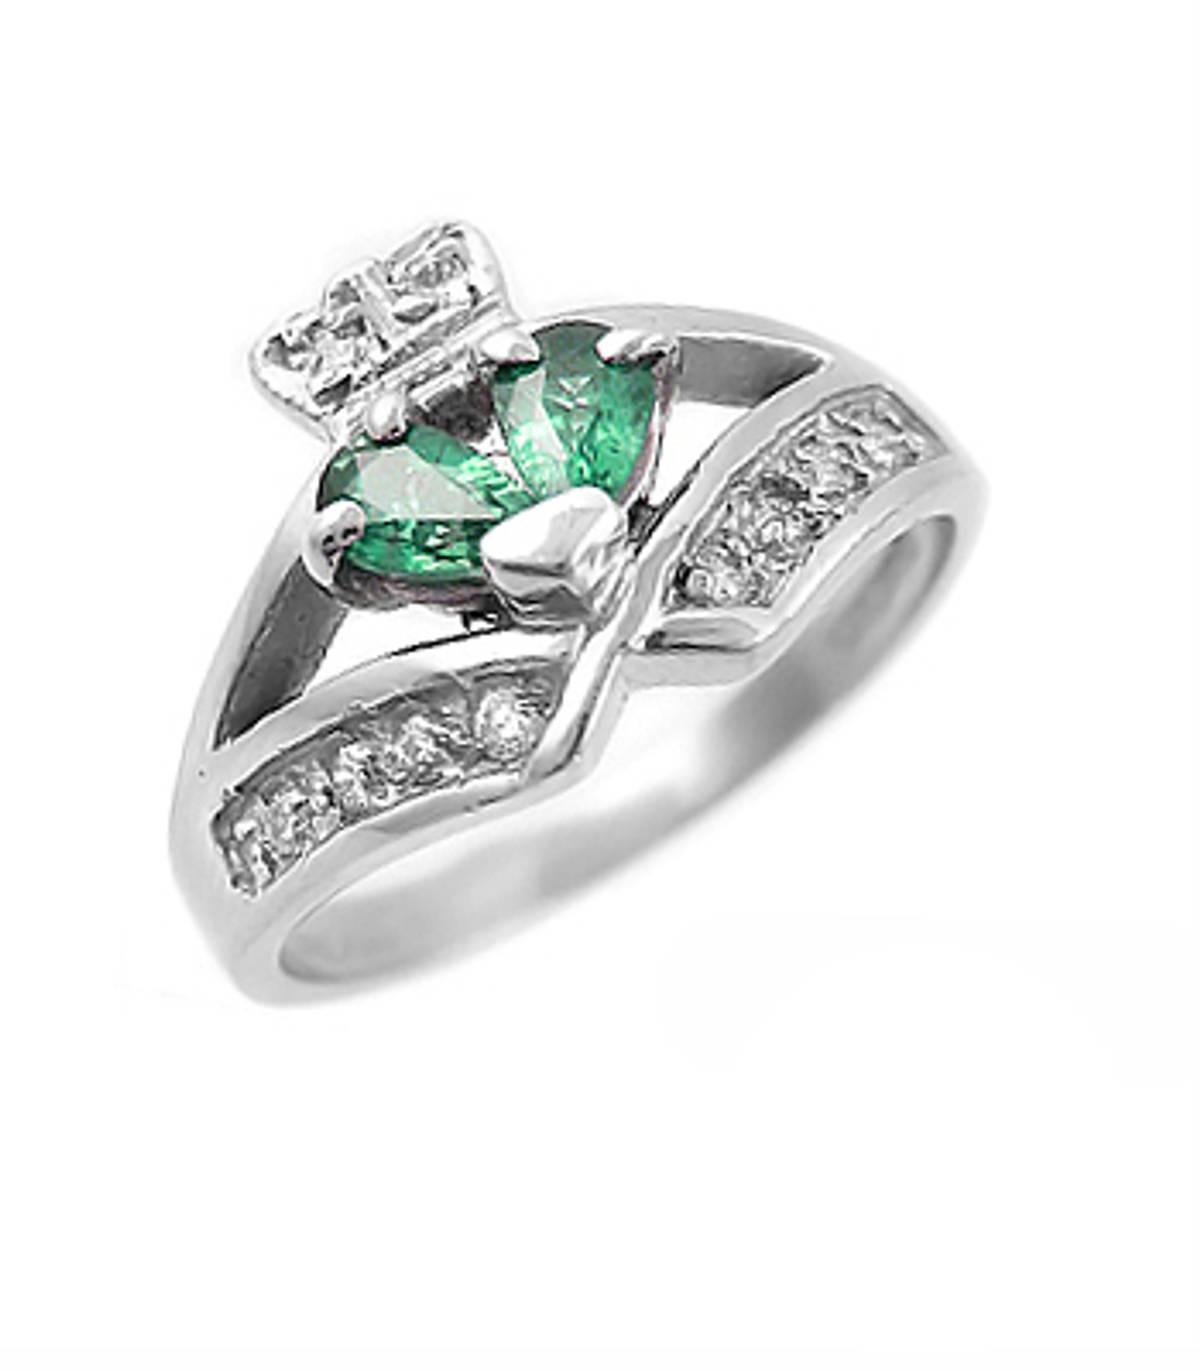 Irish made14 carat white gold 0.40cts emerald/0.12cts diamonds claddagh engagement ring